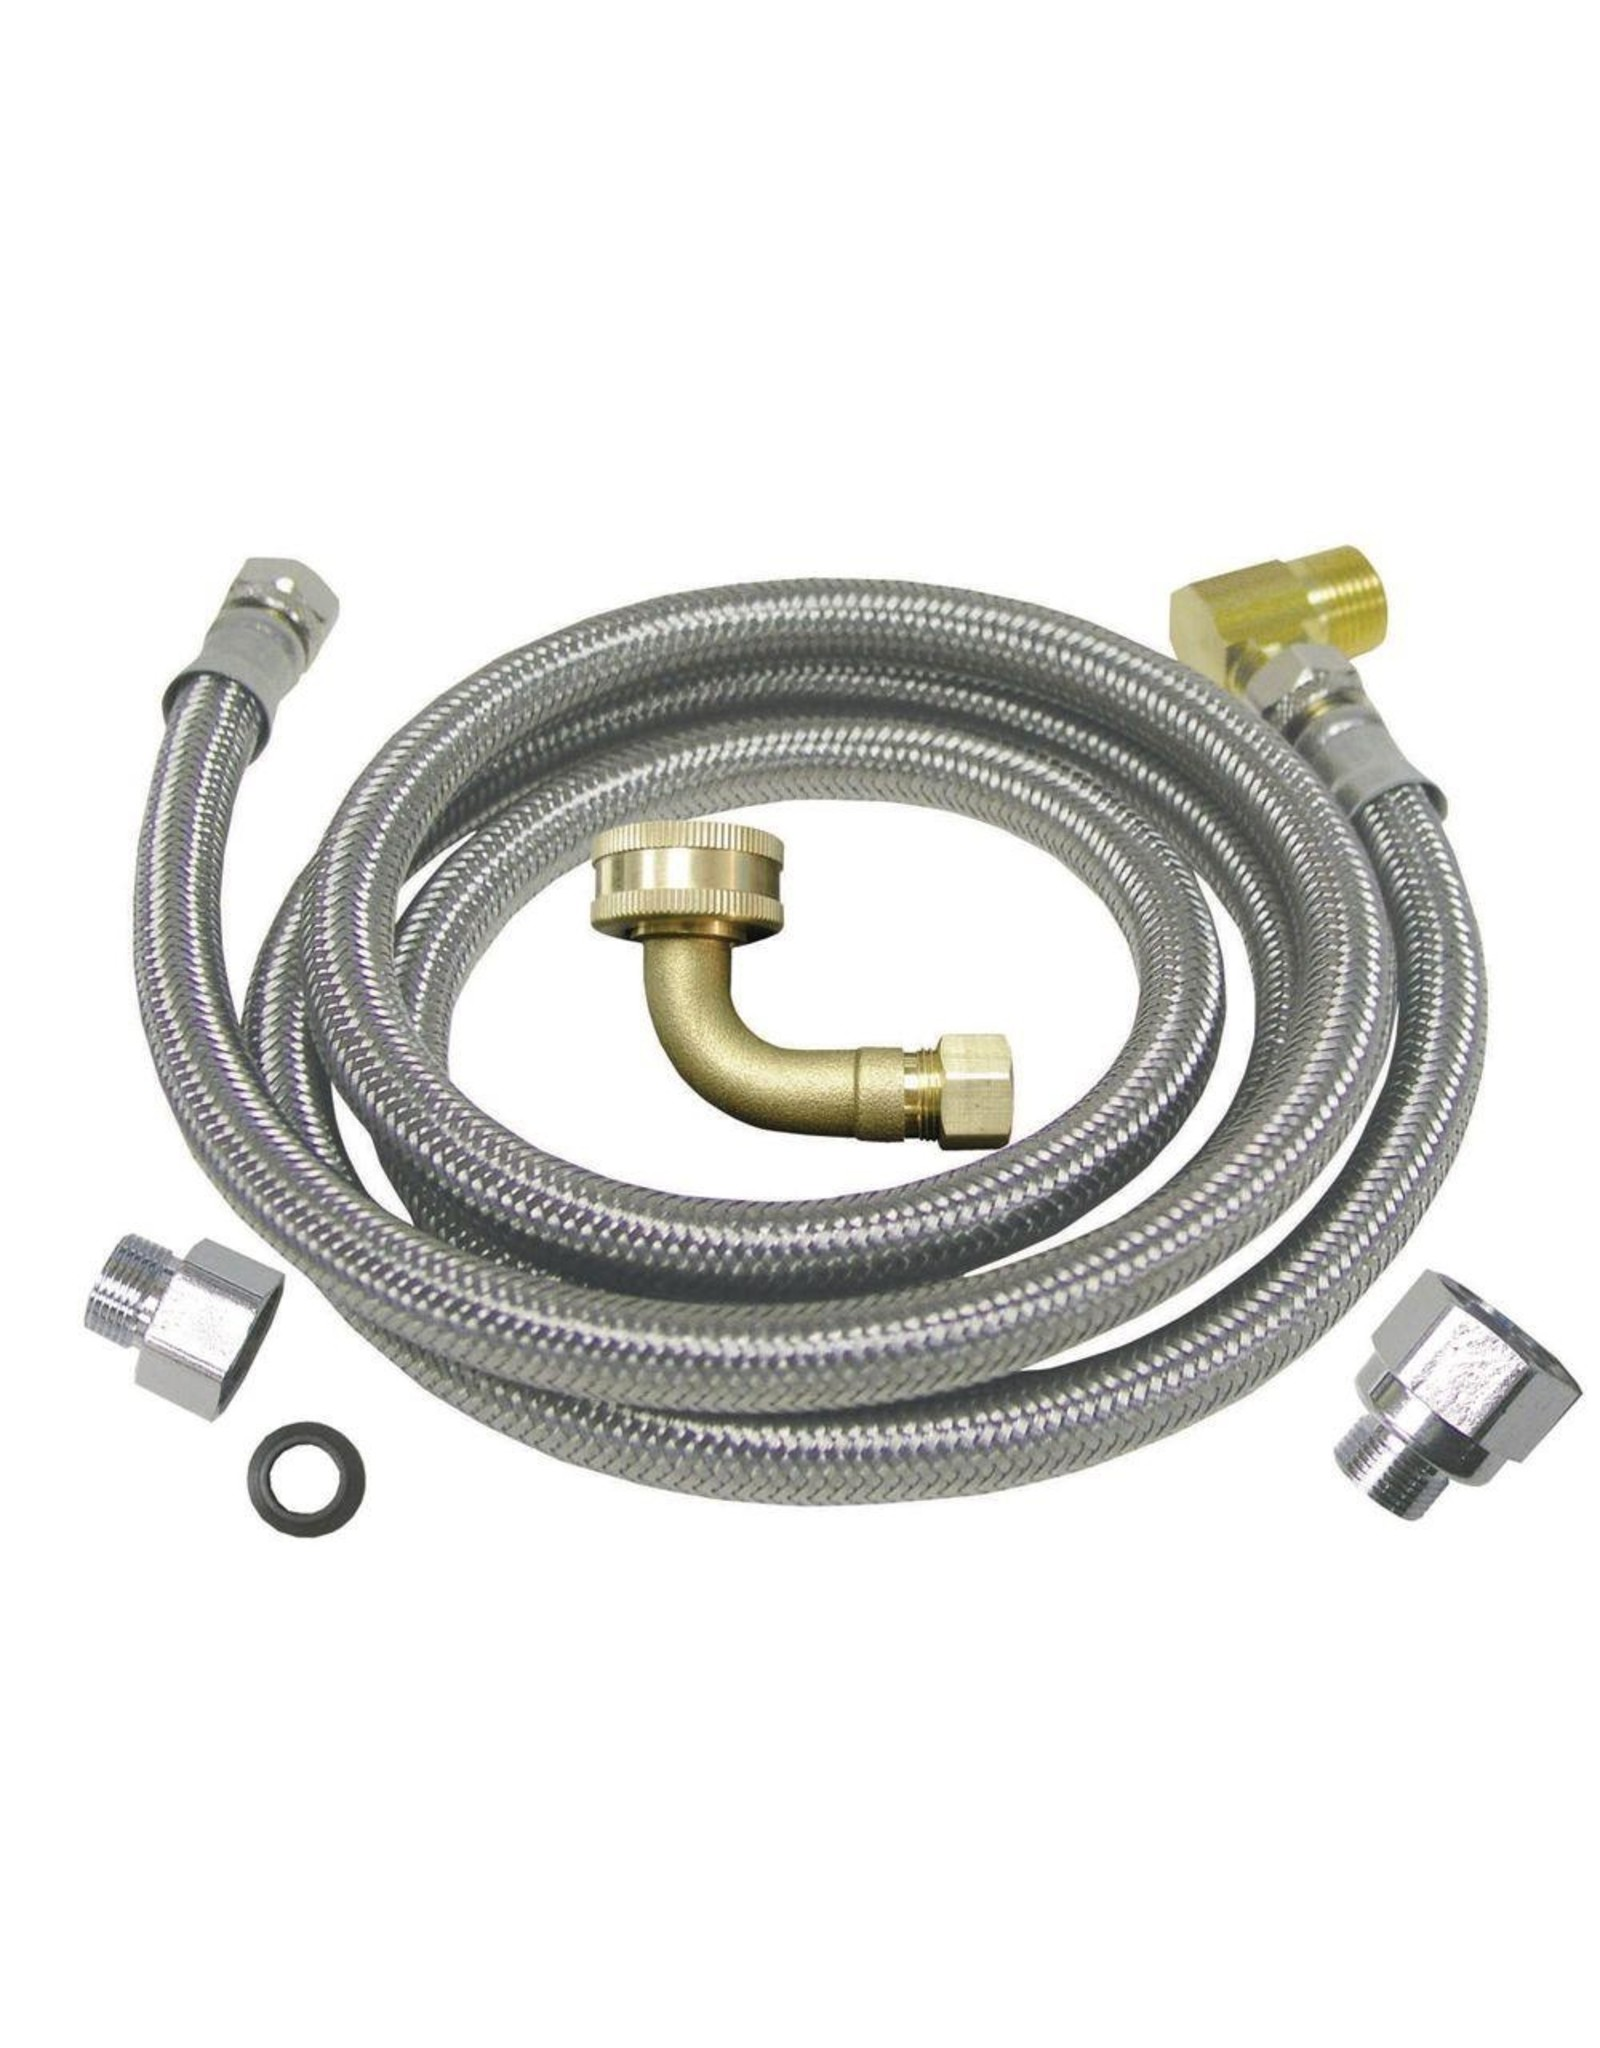 Dishwasher water hose